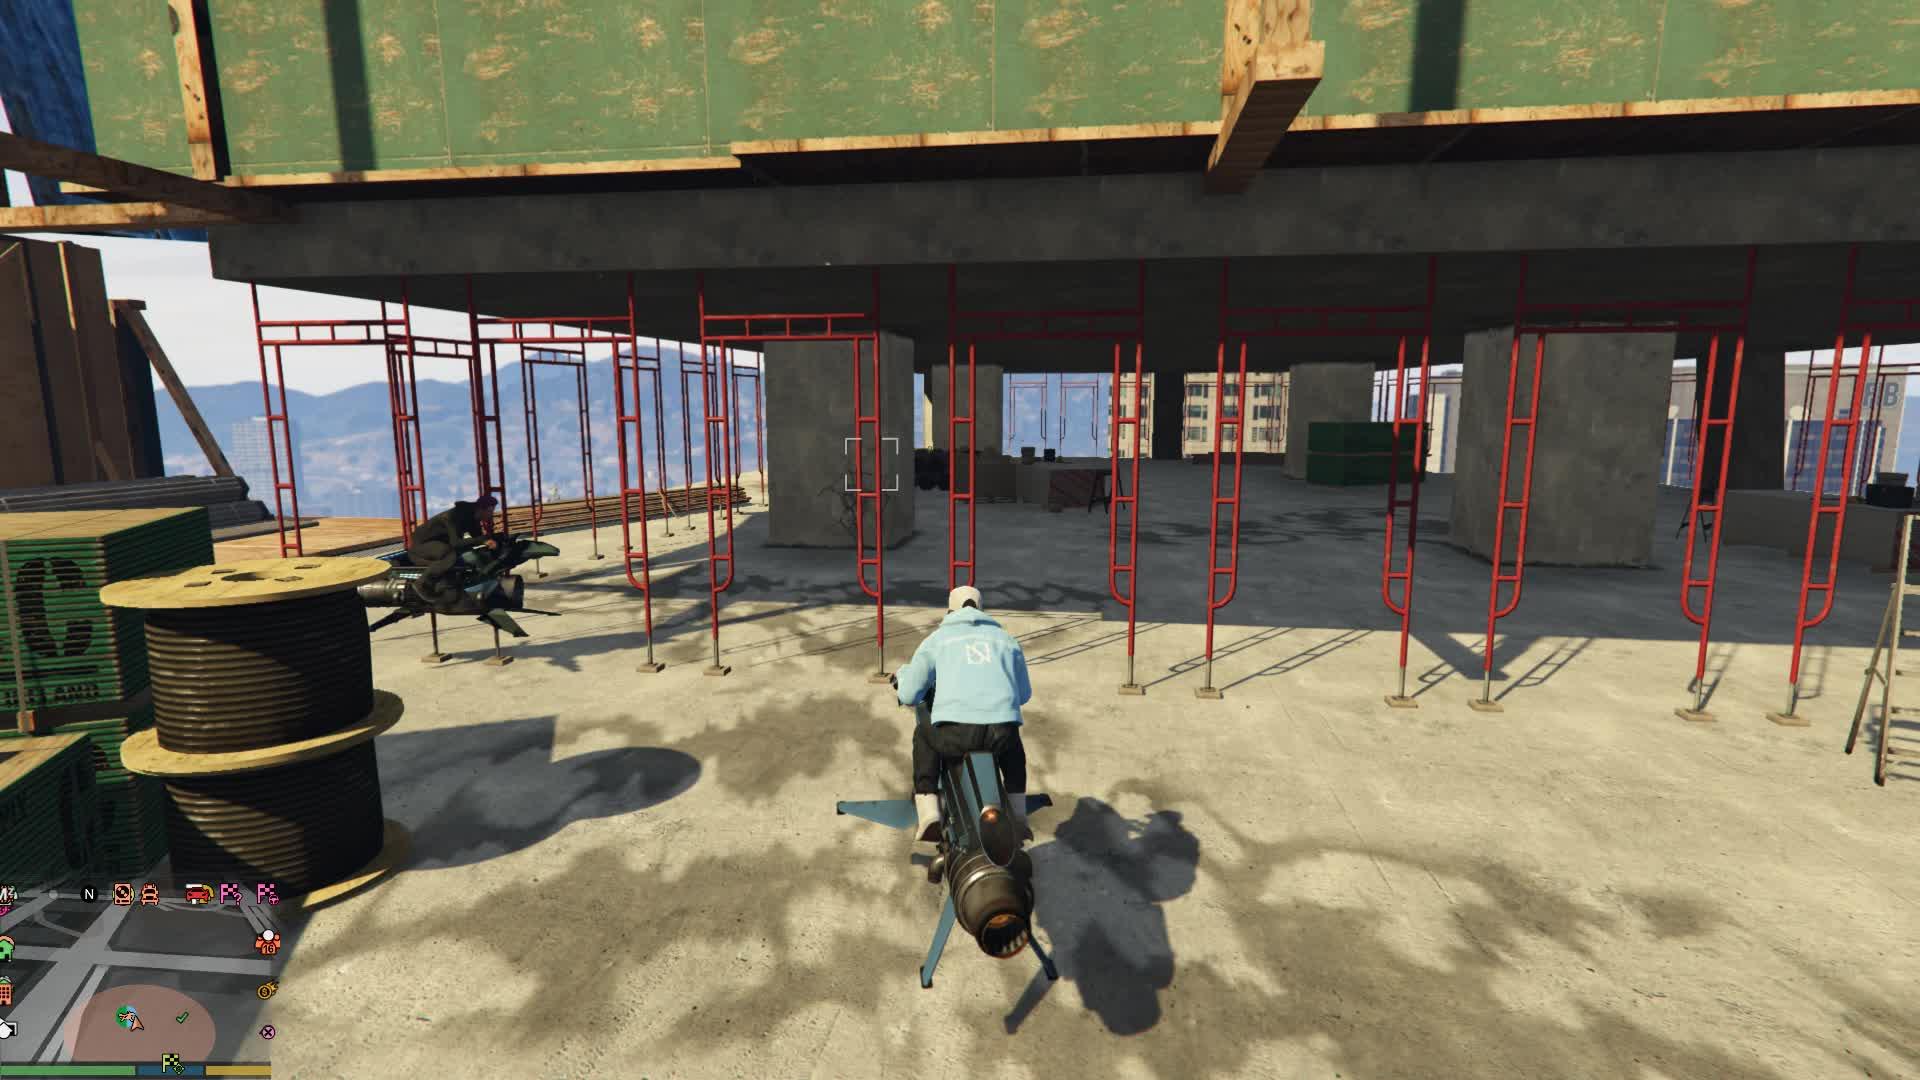 grandtheftautov, Grand Theft Auto V 2018.08.14 - 15.08.29.01 GIFs